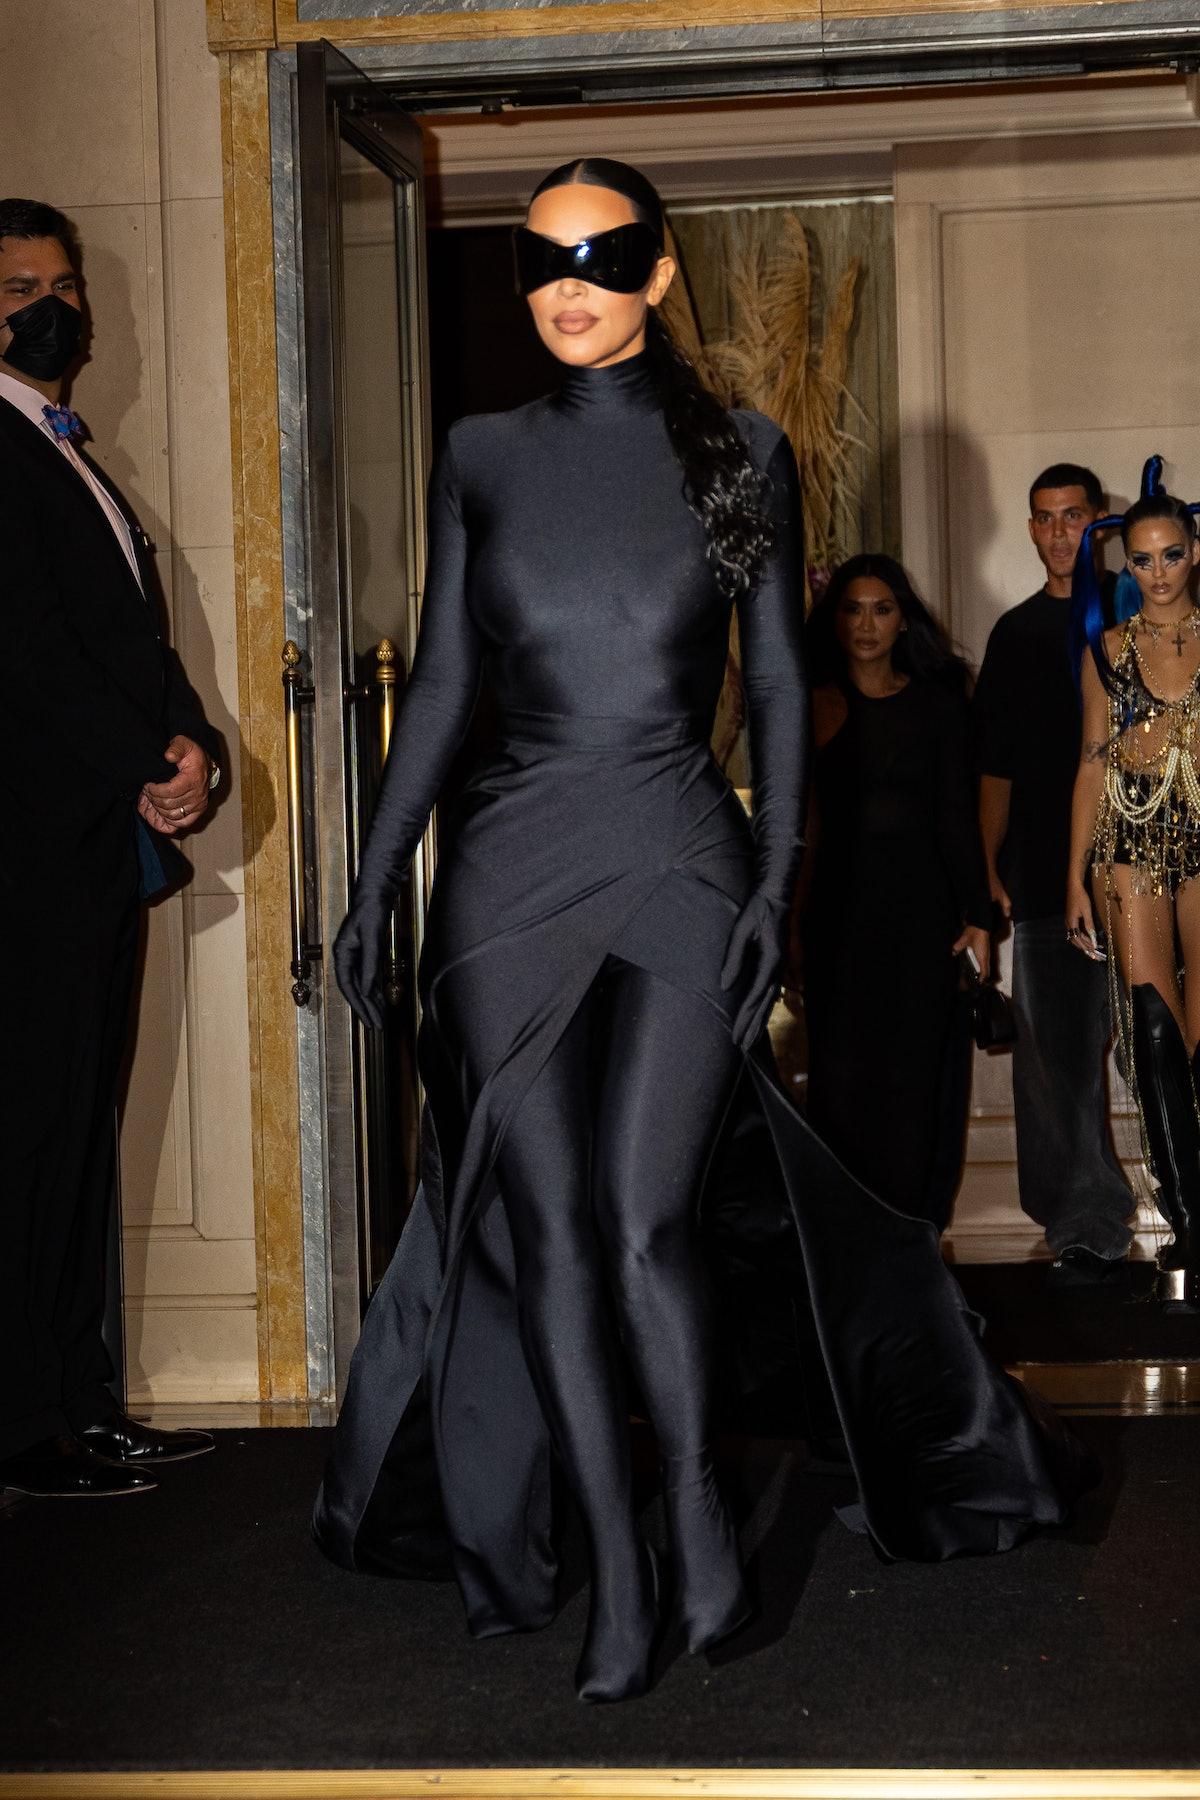 Kim Kardashian is seen in Midtown on September 13, 2021 in New York City.